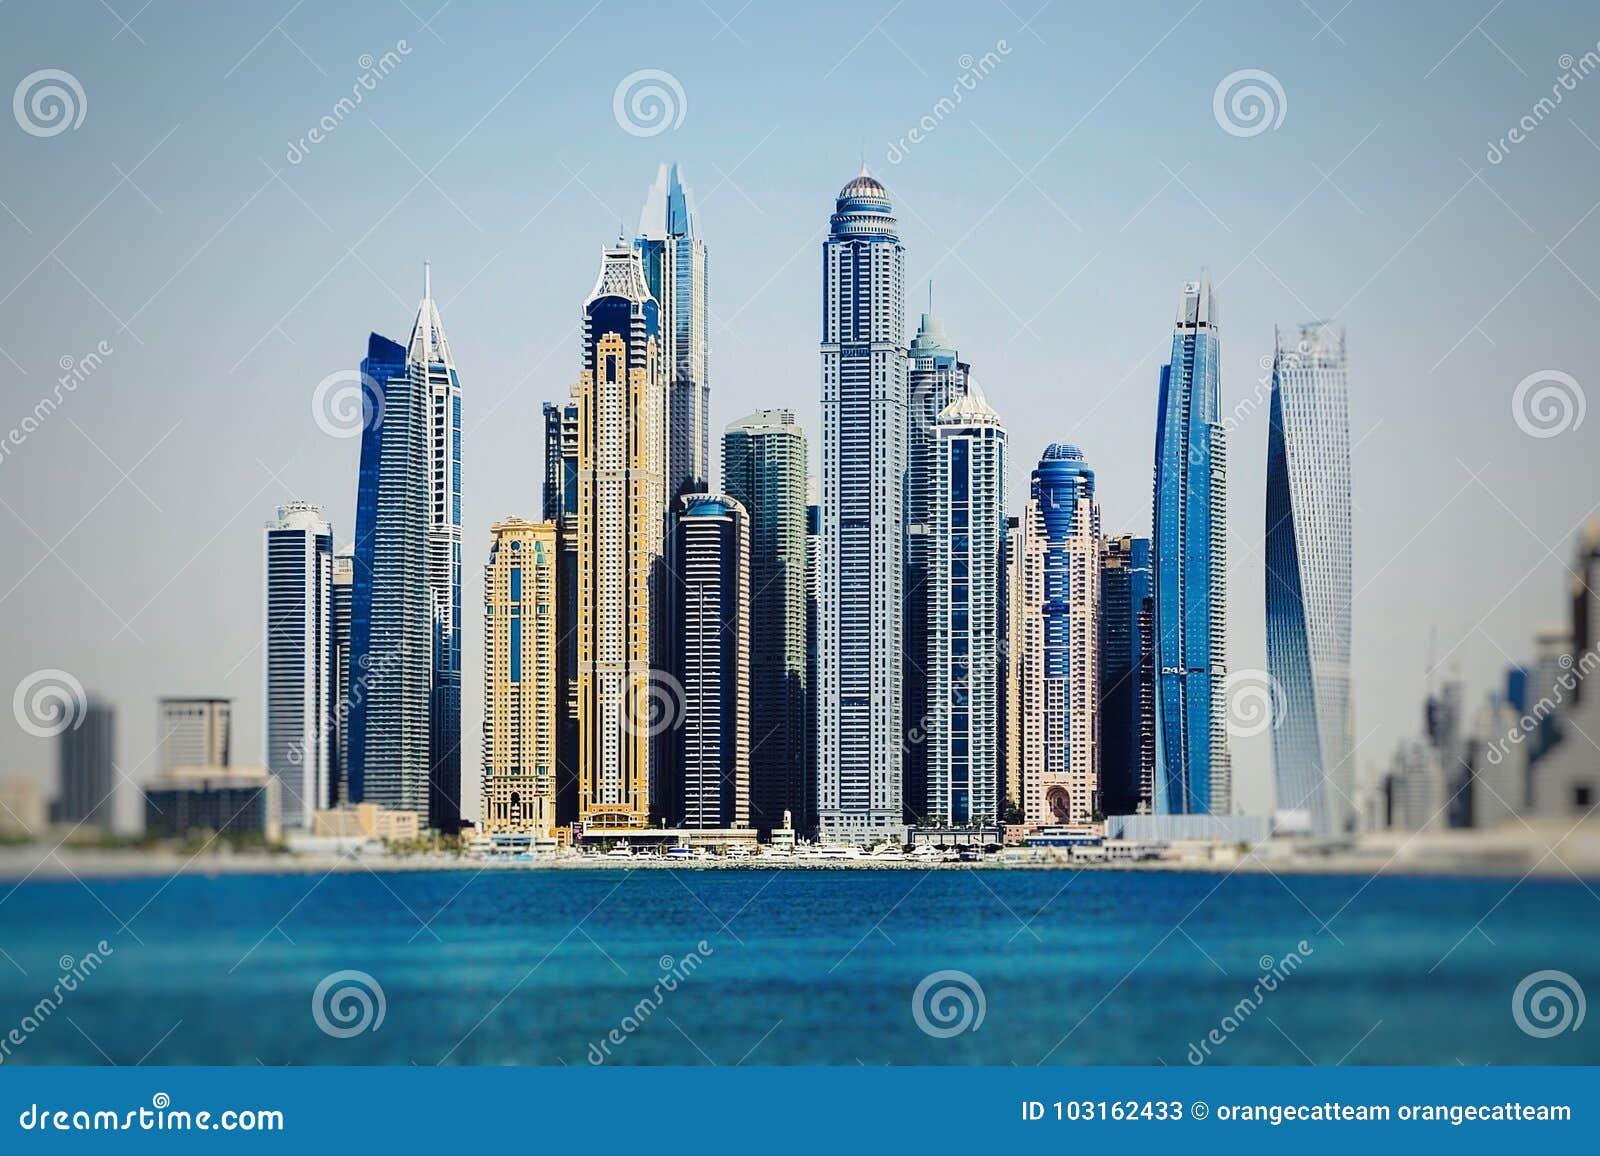 Paisaje urbano en United Arab Emirates